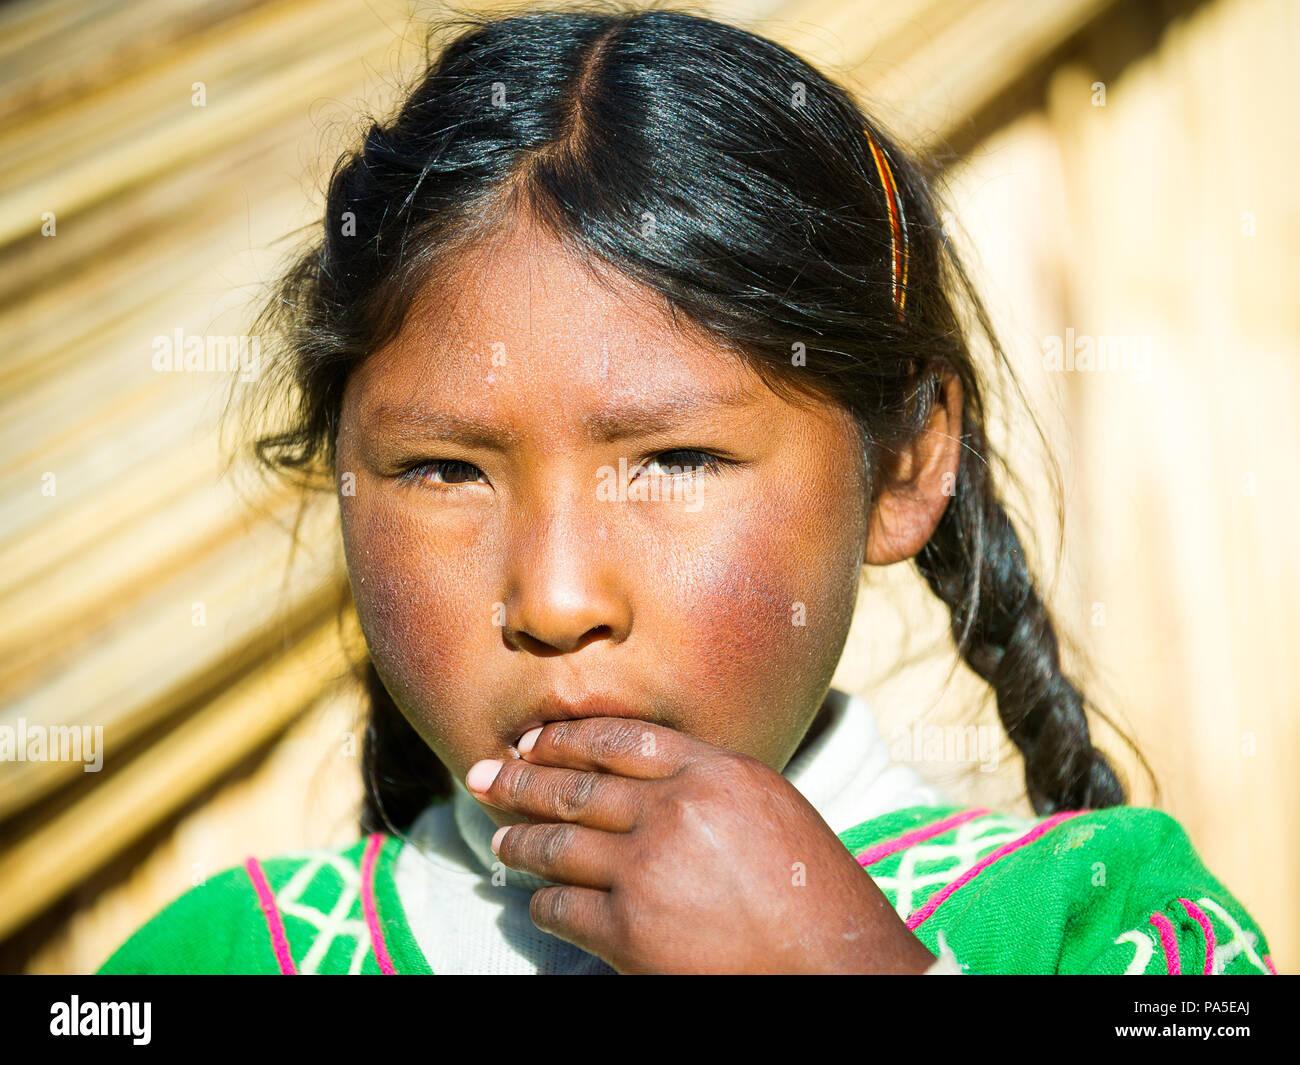 PUNO, PERU - NOVEMBER 7, 2010: Unidentified Uros girl who lives on the Uros Islands, Peru, Nov 7, 2010. Uros Islands iclude 42 floating islands. Stock Photo